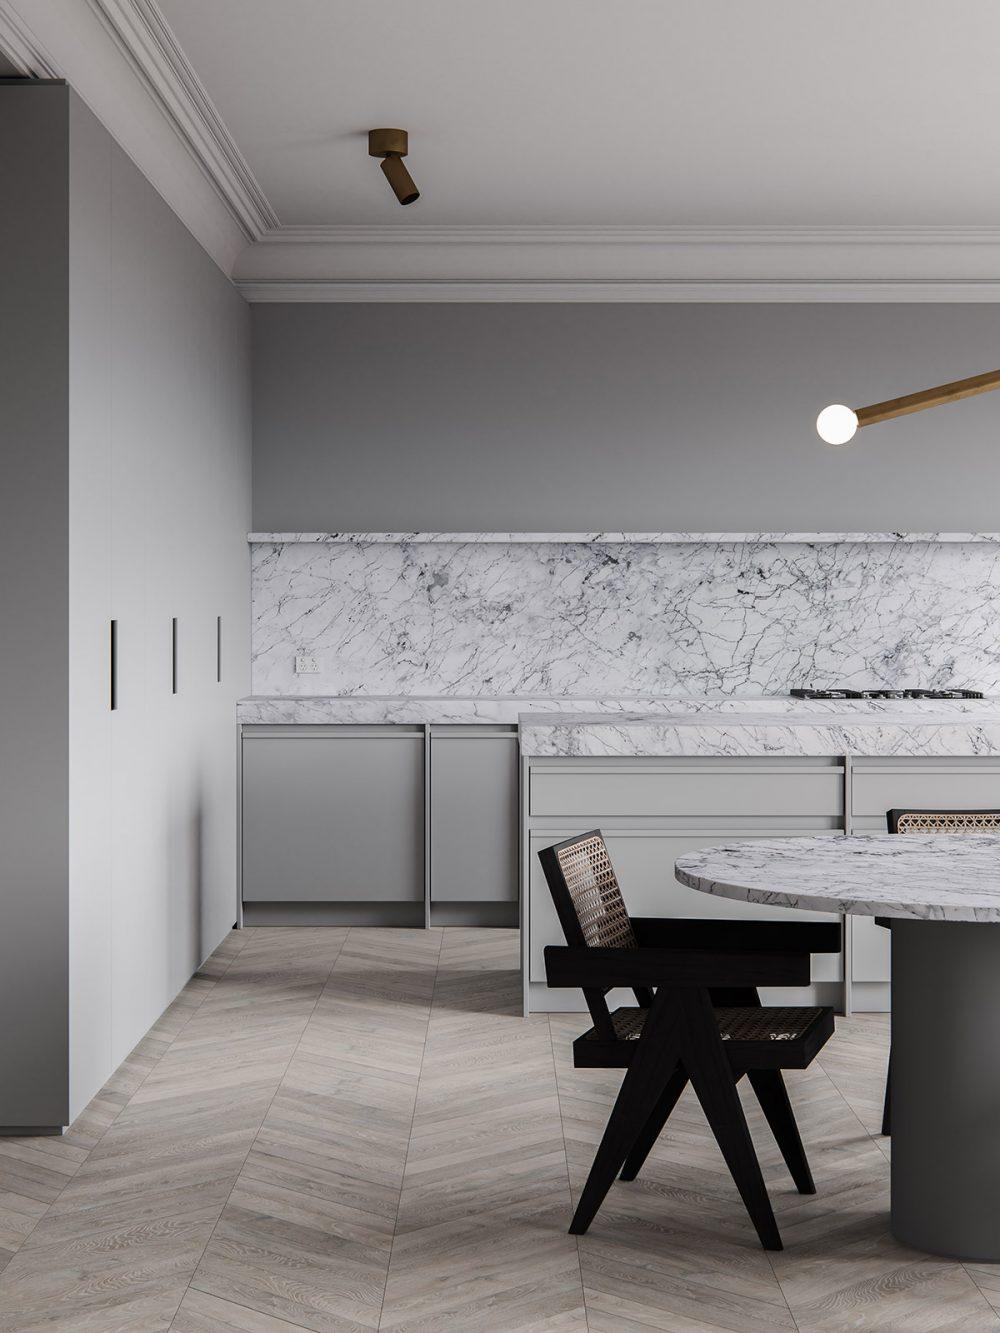 3d interior render. ScreenAge featured project - MIST Kitchen Hero